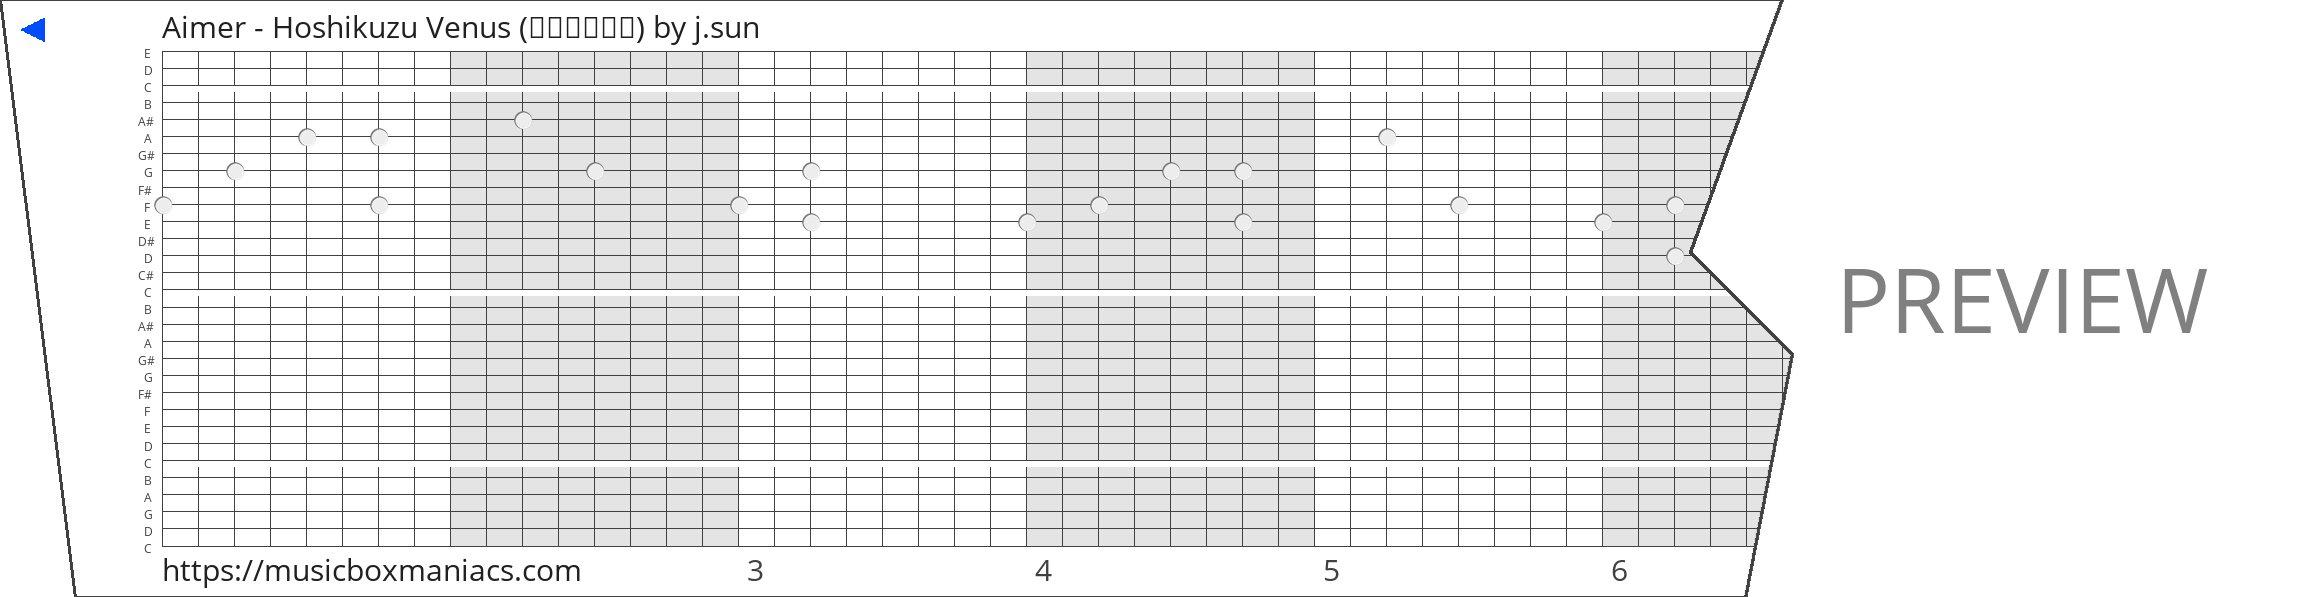 Aimer - Hoshikuzu Venus (星屑ビーナス) 30 note music box paper strip